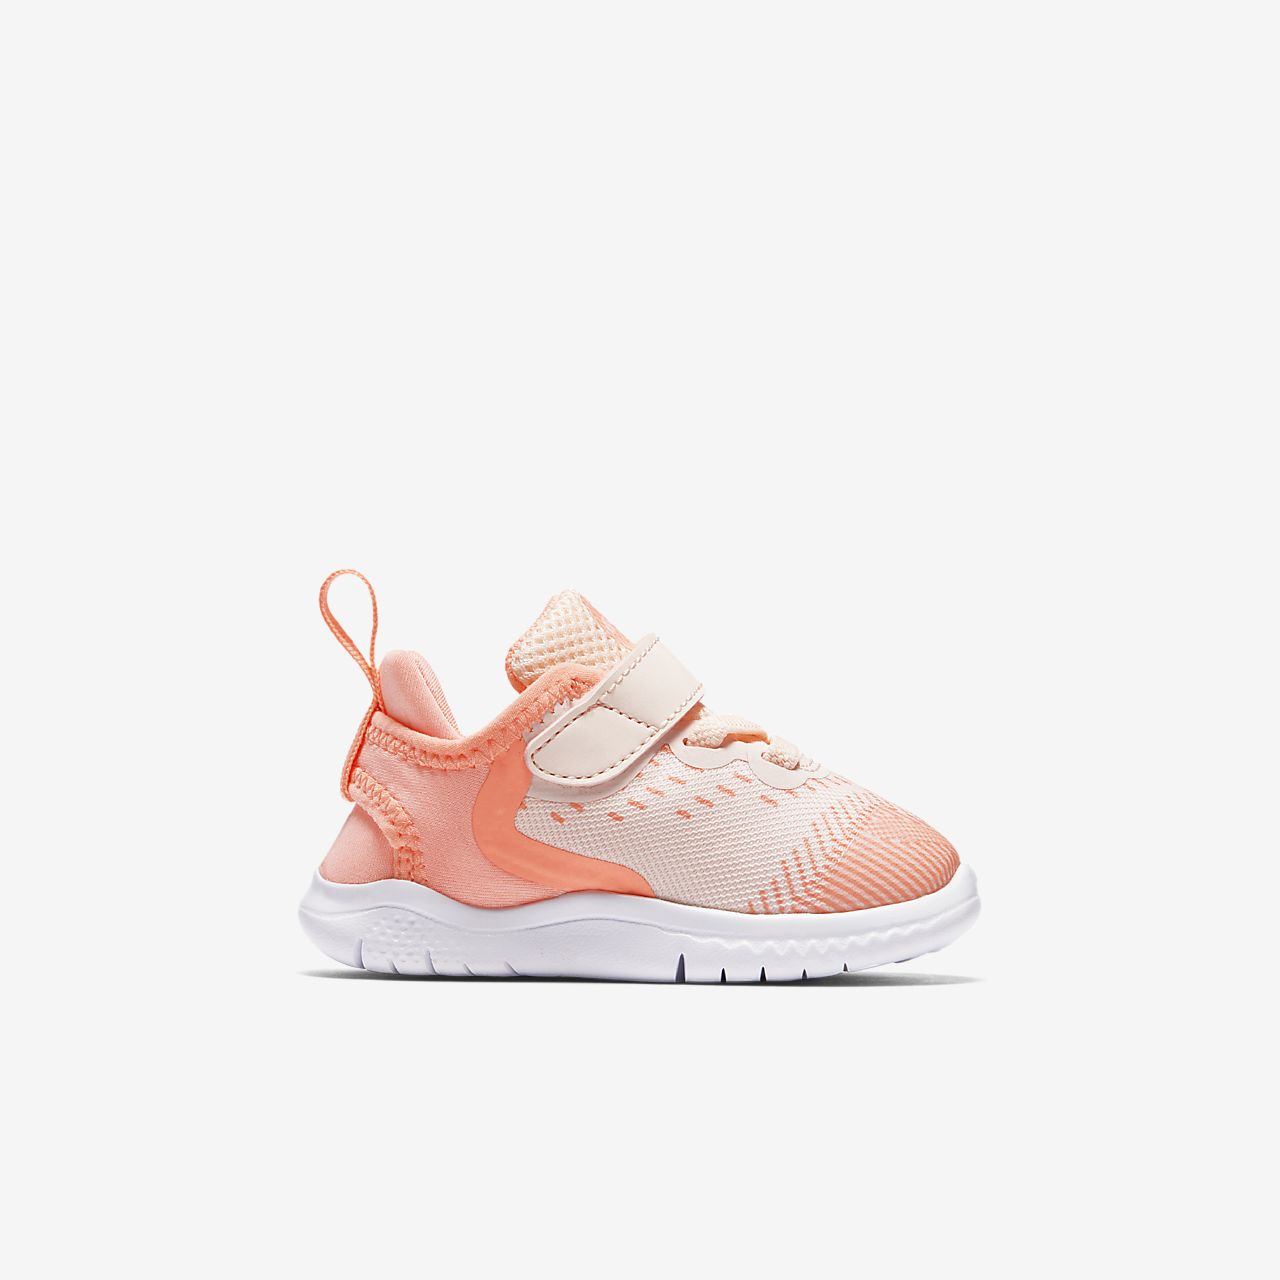 brand new 33cd3 4b0e0 Nike Free RN 2018